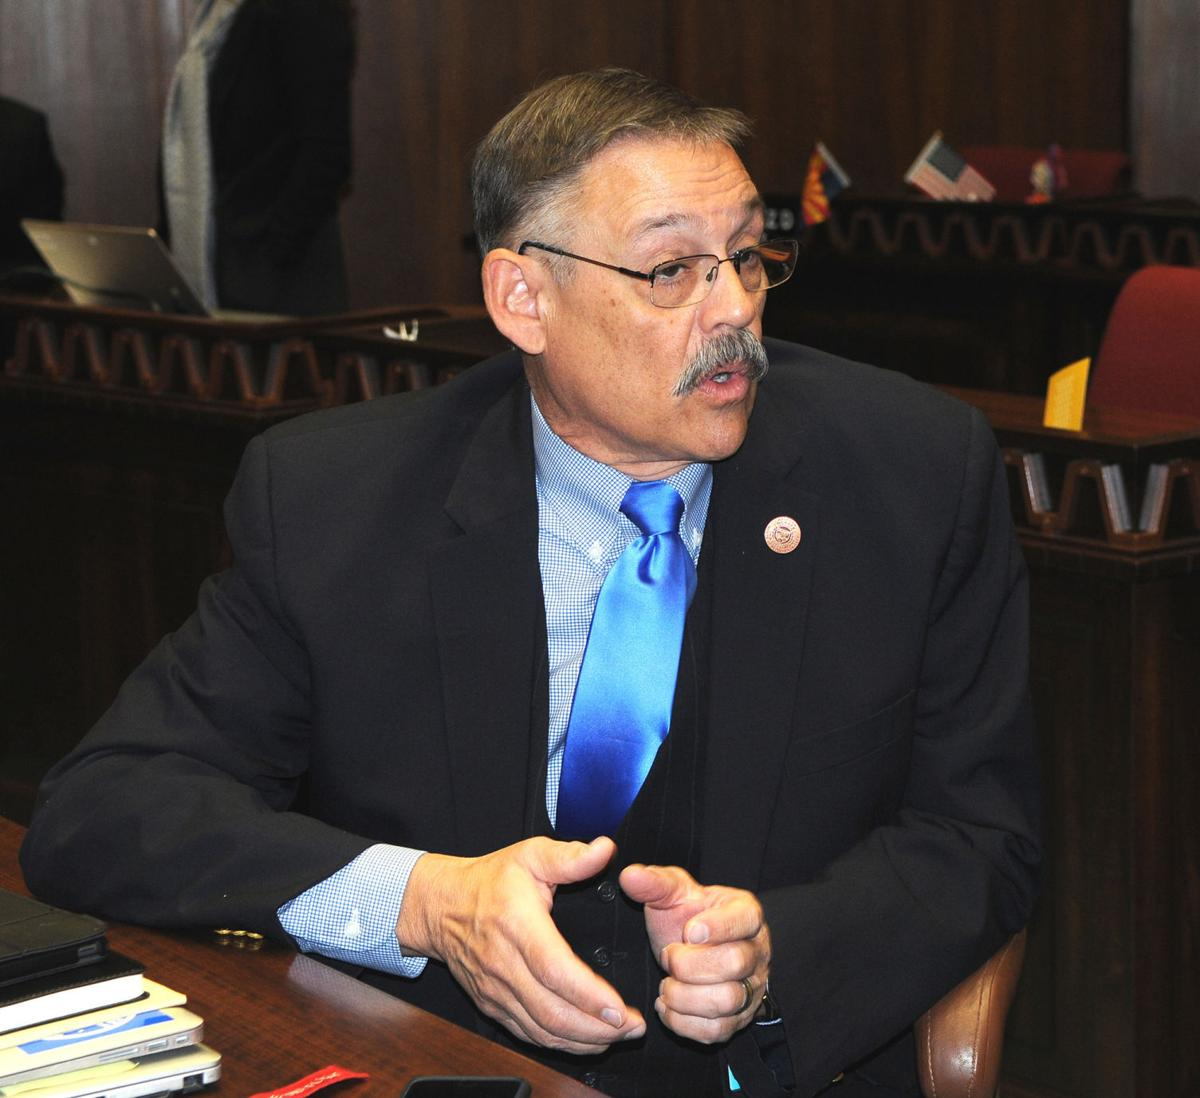 Arizona State Rep. Mark Finchem